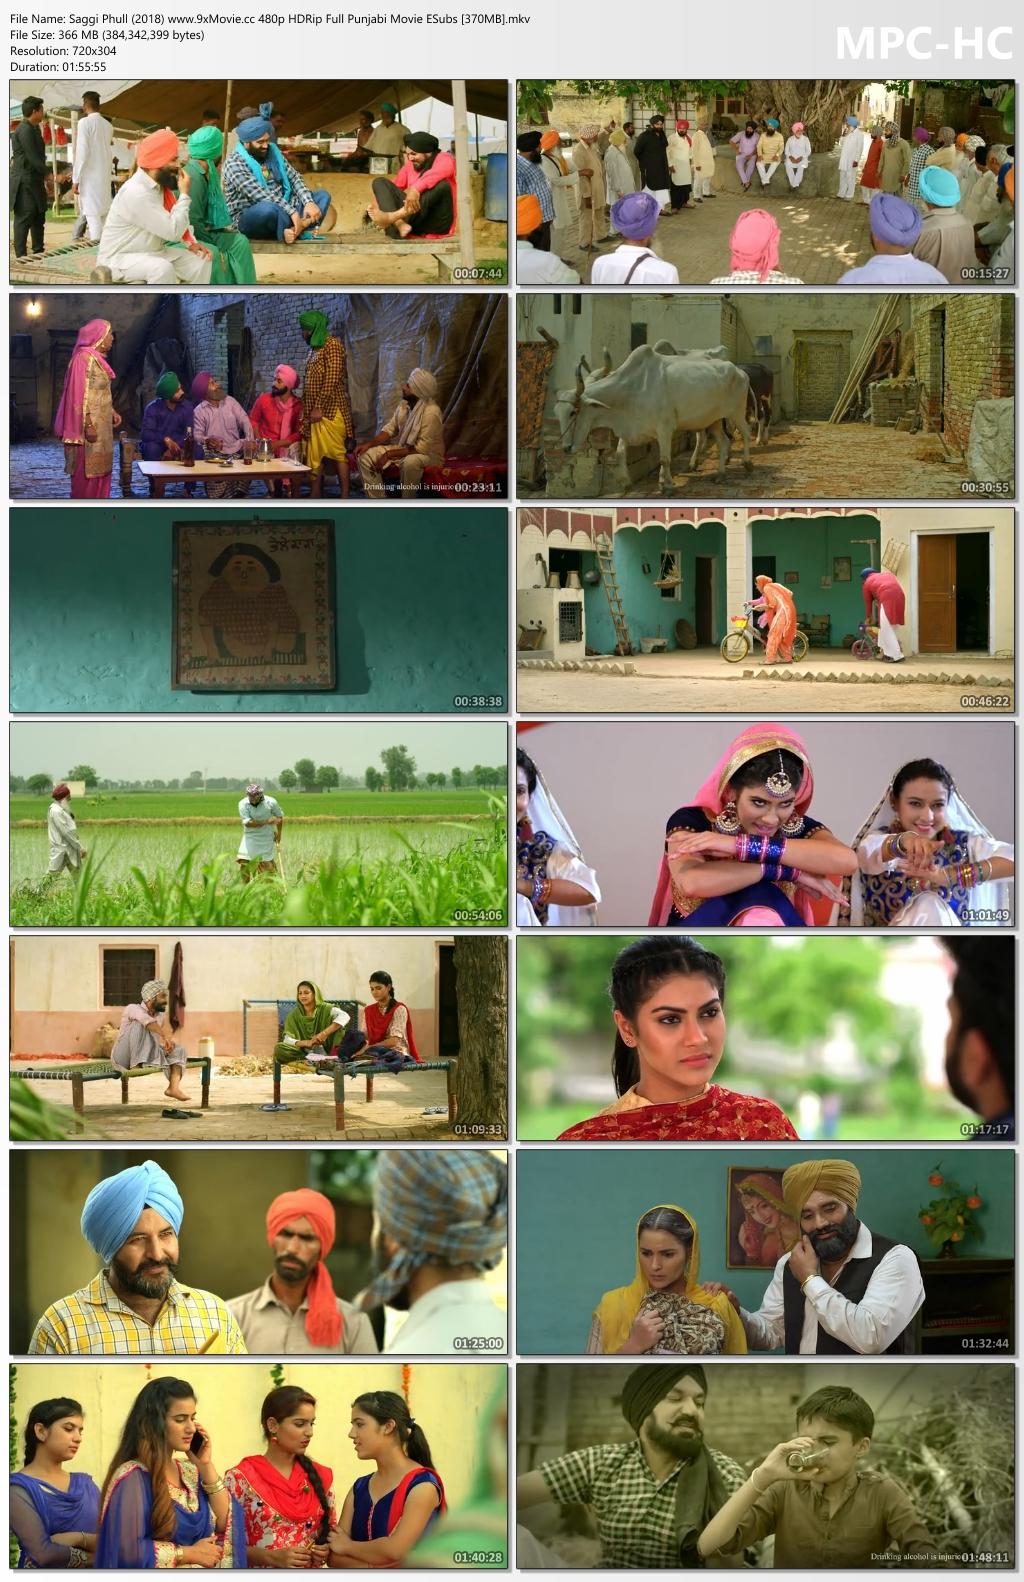 Saggi-Phull-2018-www-9x-Movie-cc-480p-HDRip-Full-Punjabi-Movie-ESubs-370-MB-mkv